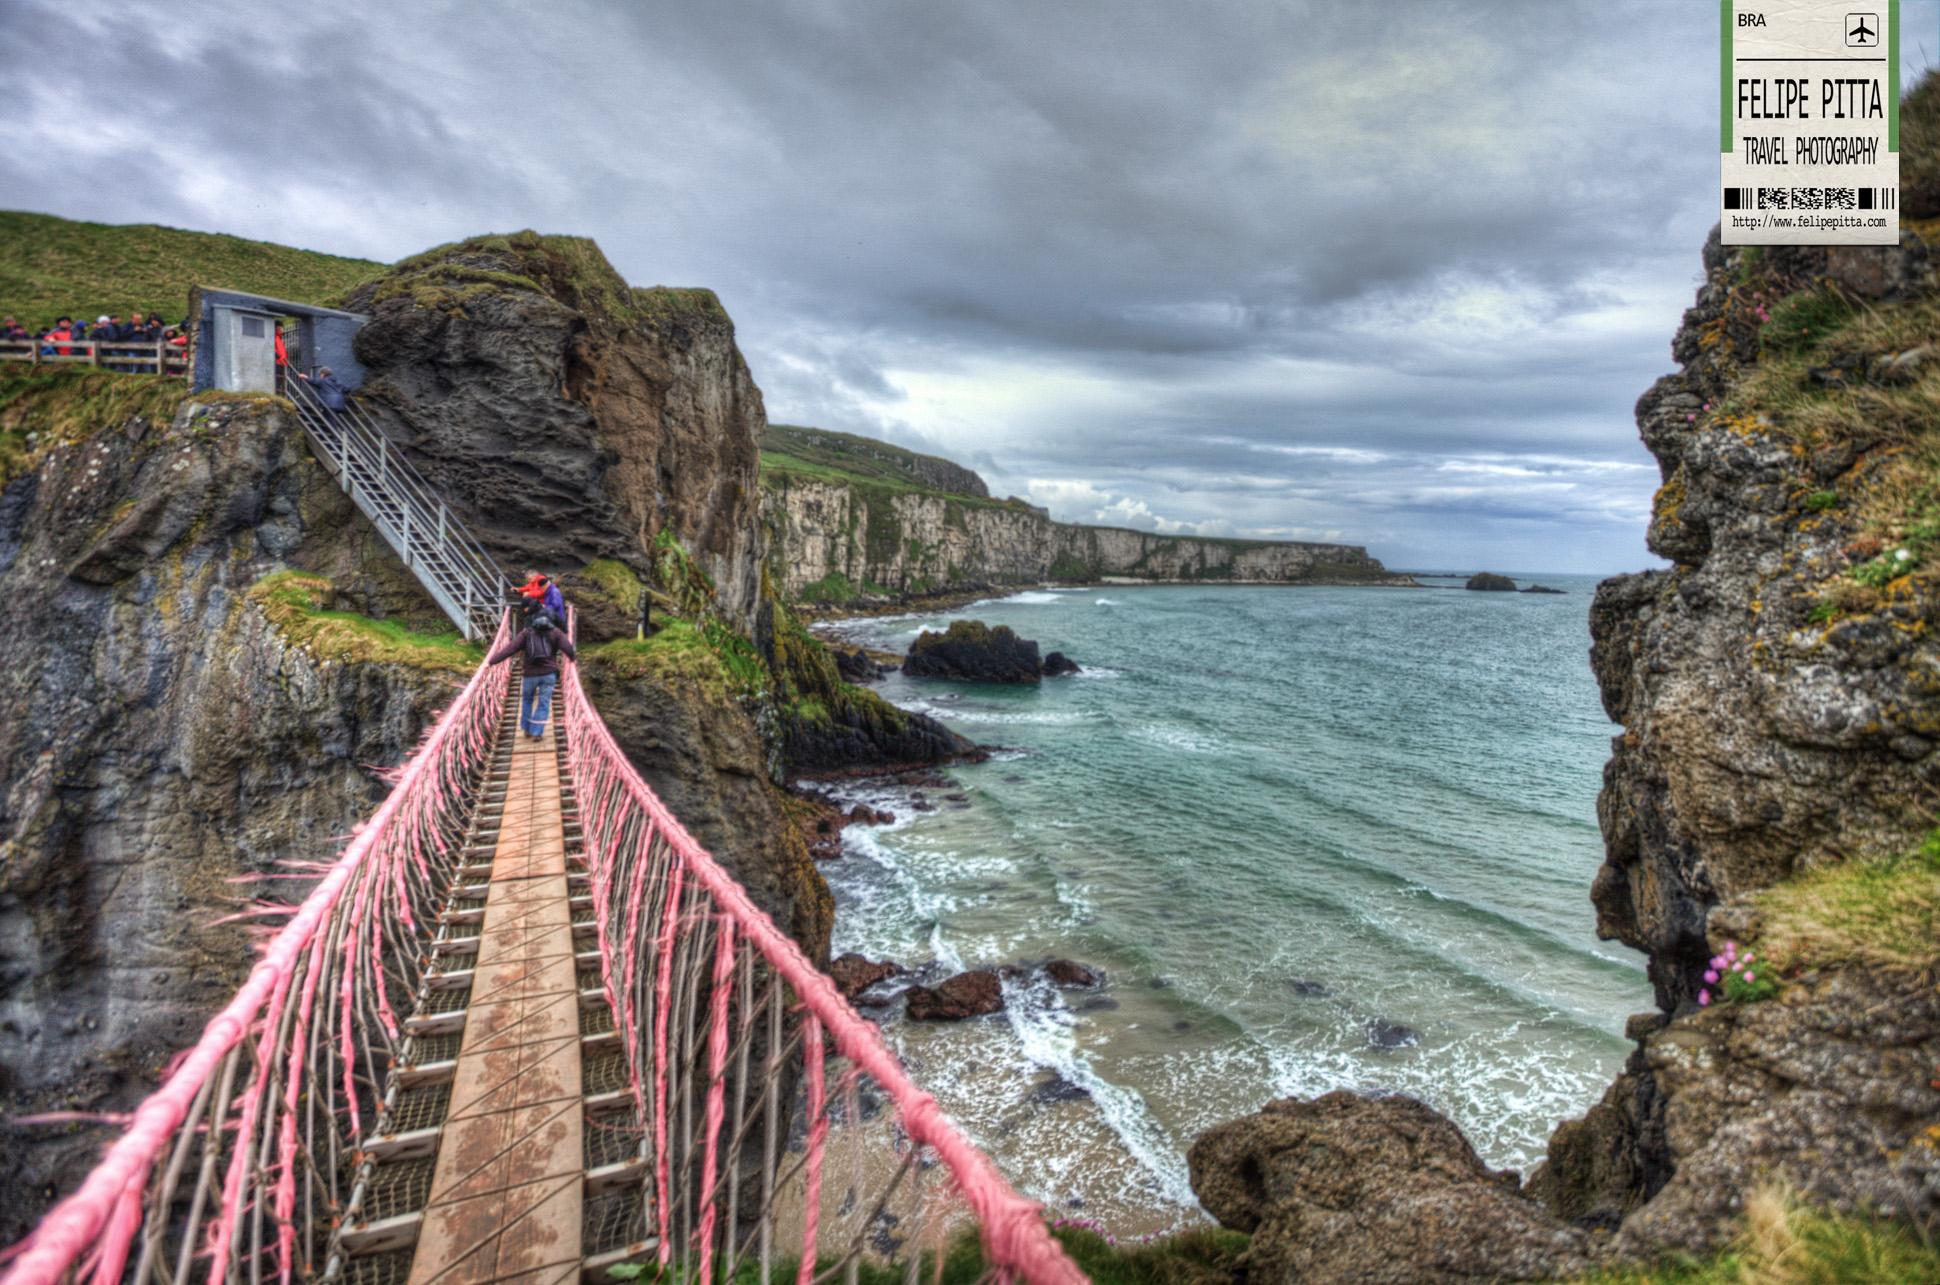 Carrick-a-Rede Rope Bridge - Northern Ireland - UK